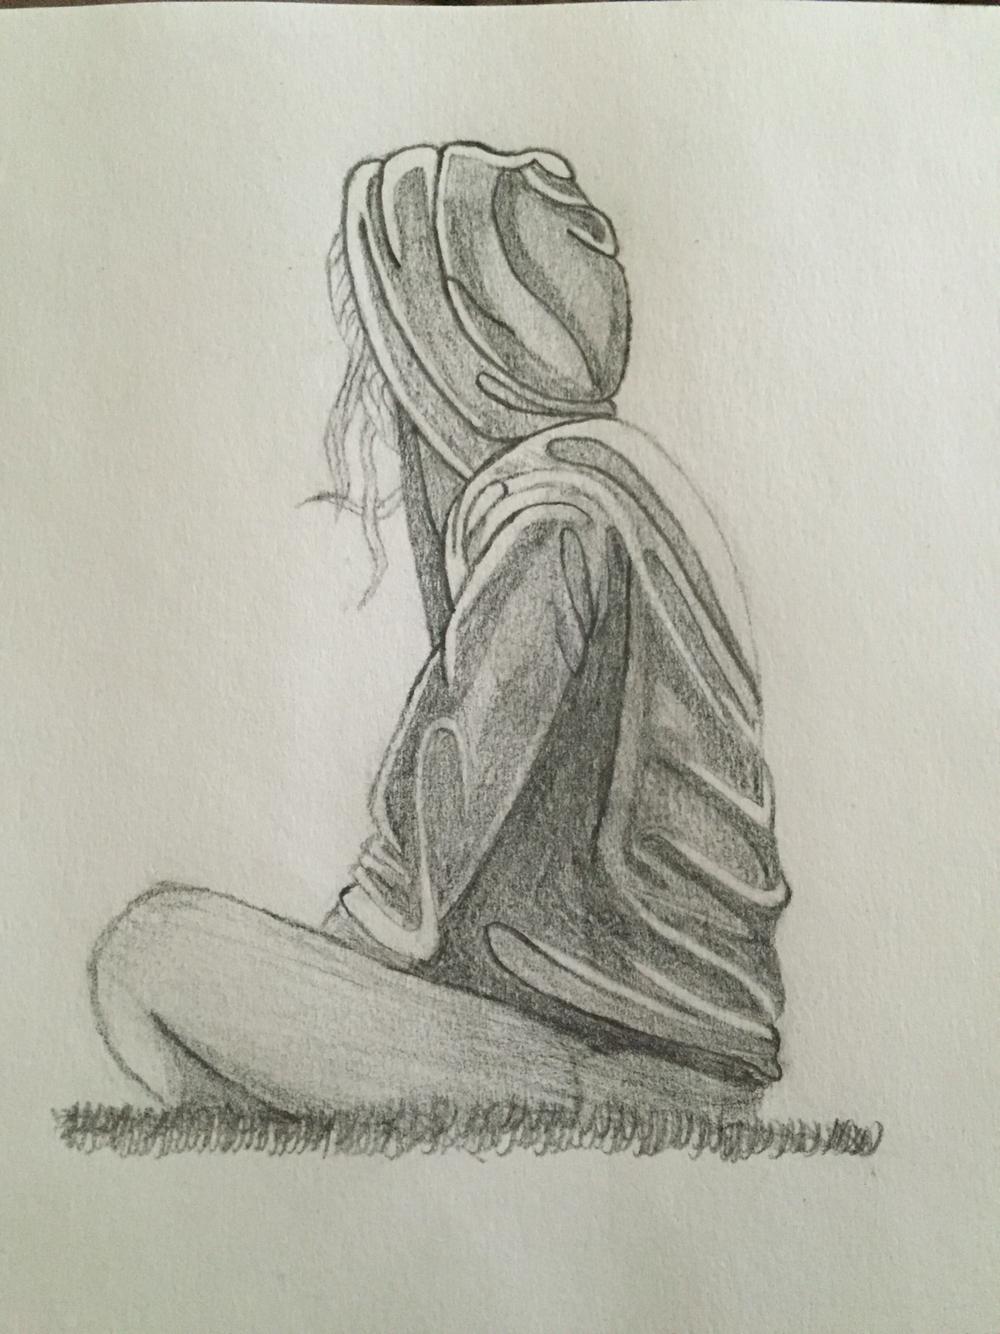 1000x1334 Pencil Sketching Of Sad Girl 3d Pencils Sketching Wallpapers Sad